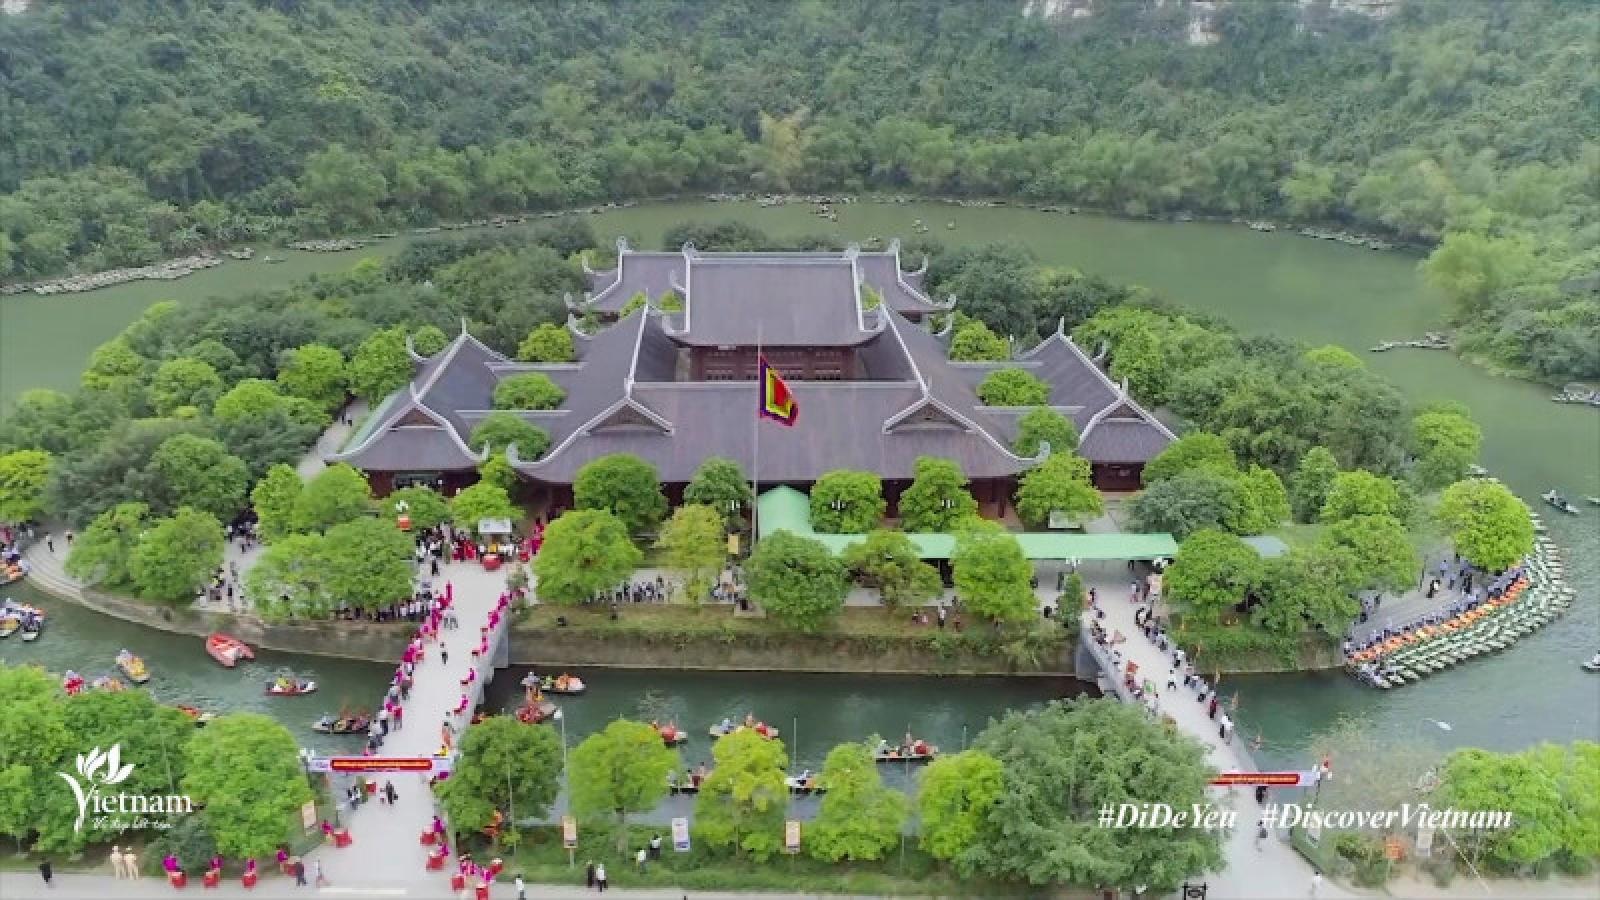 Tourism promotion clip showcases beautiful landscapes of Ninh Binh